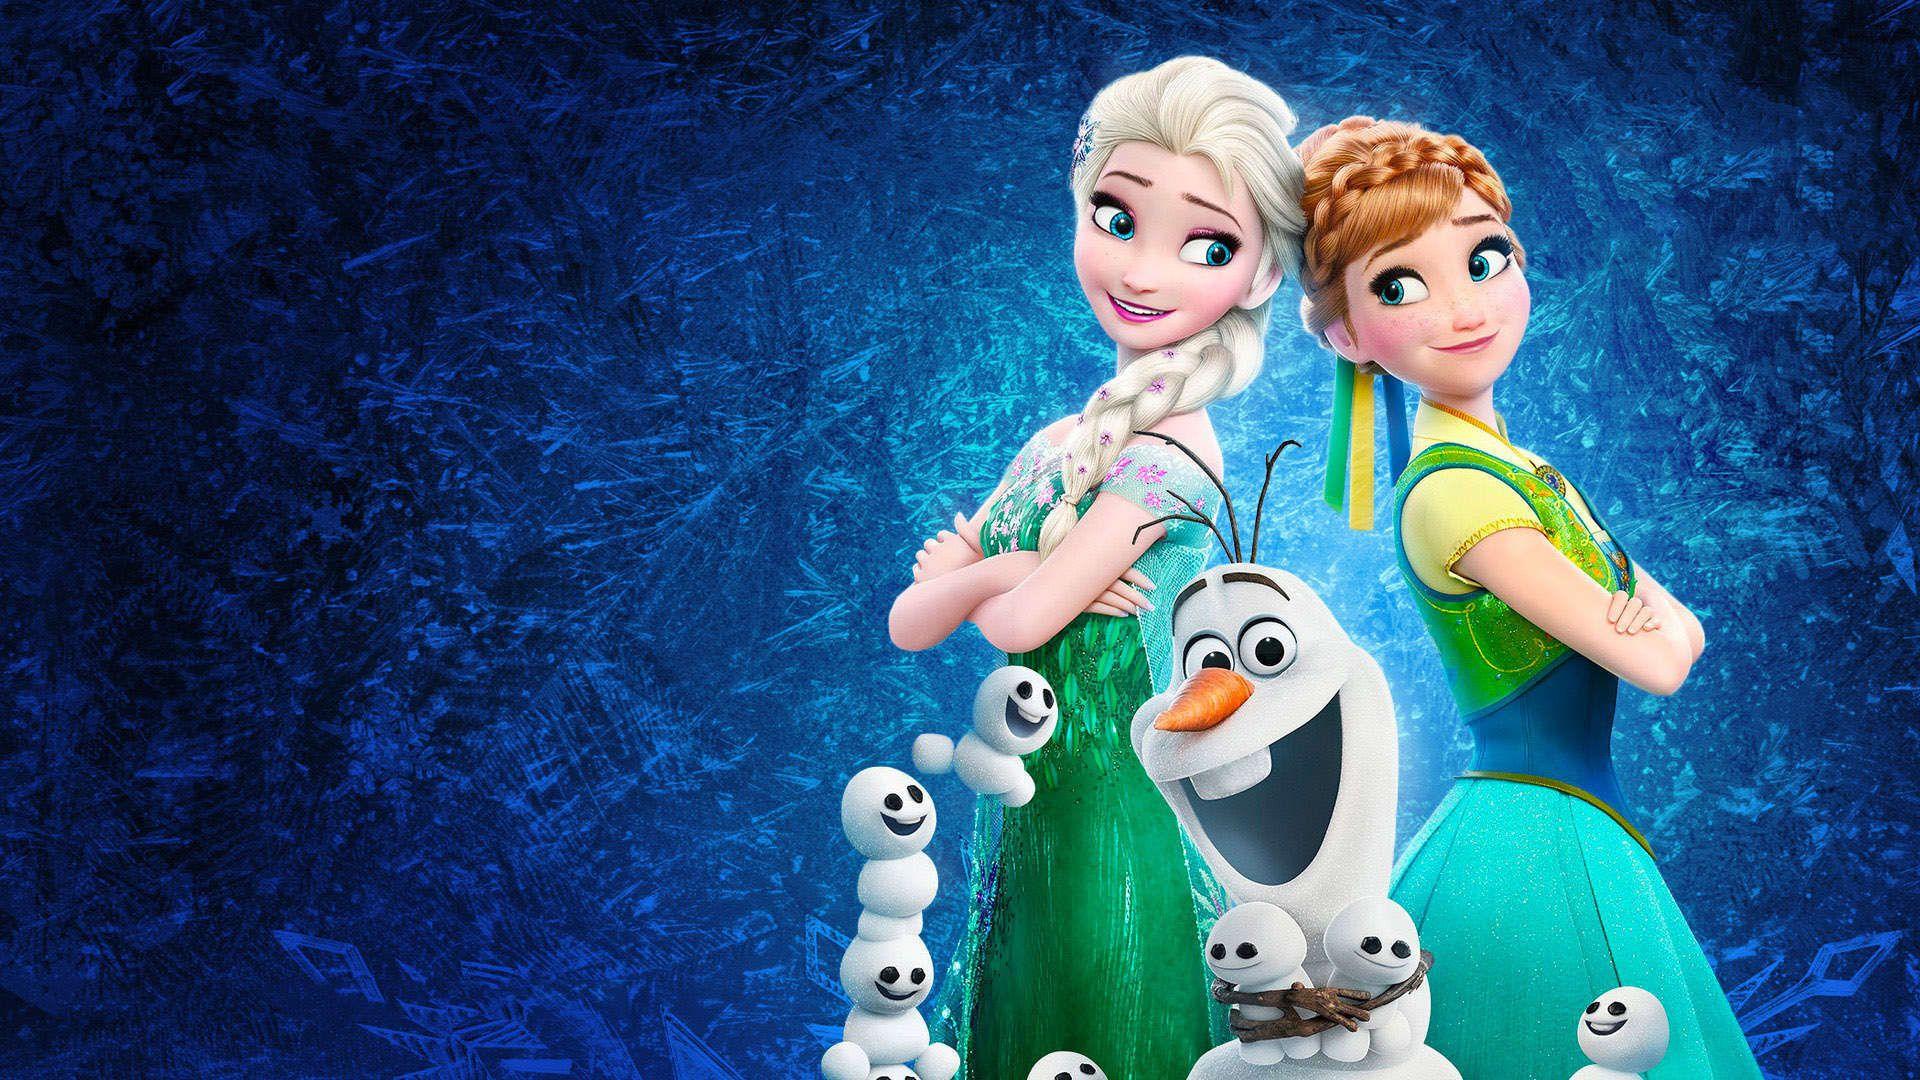 Hd Wallpaper Frozen Background 1080p kita Pinterest